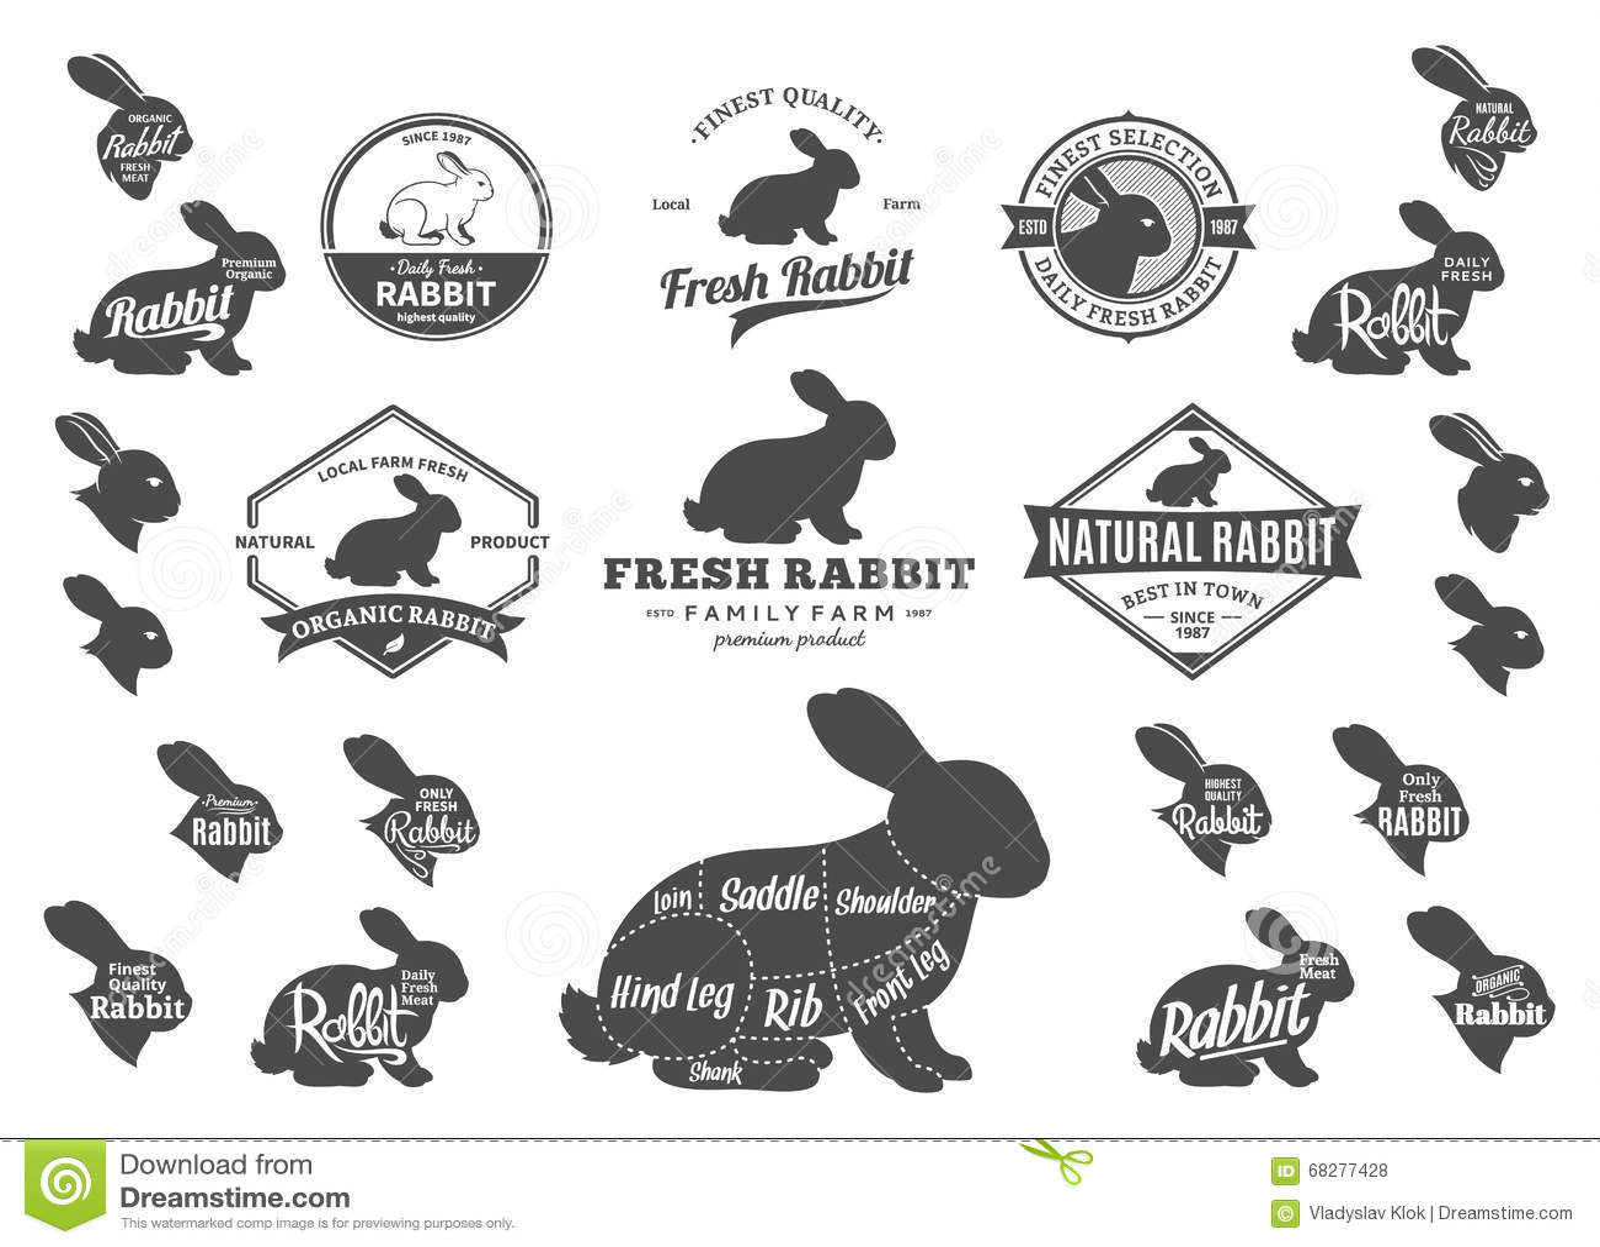 Butchery business plan